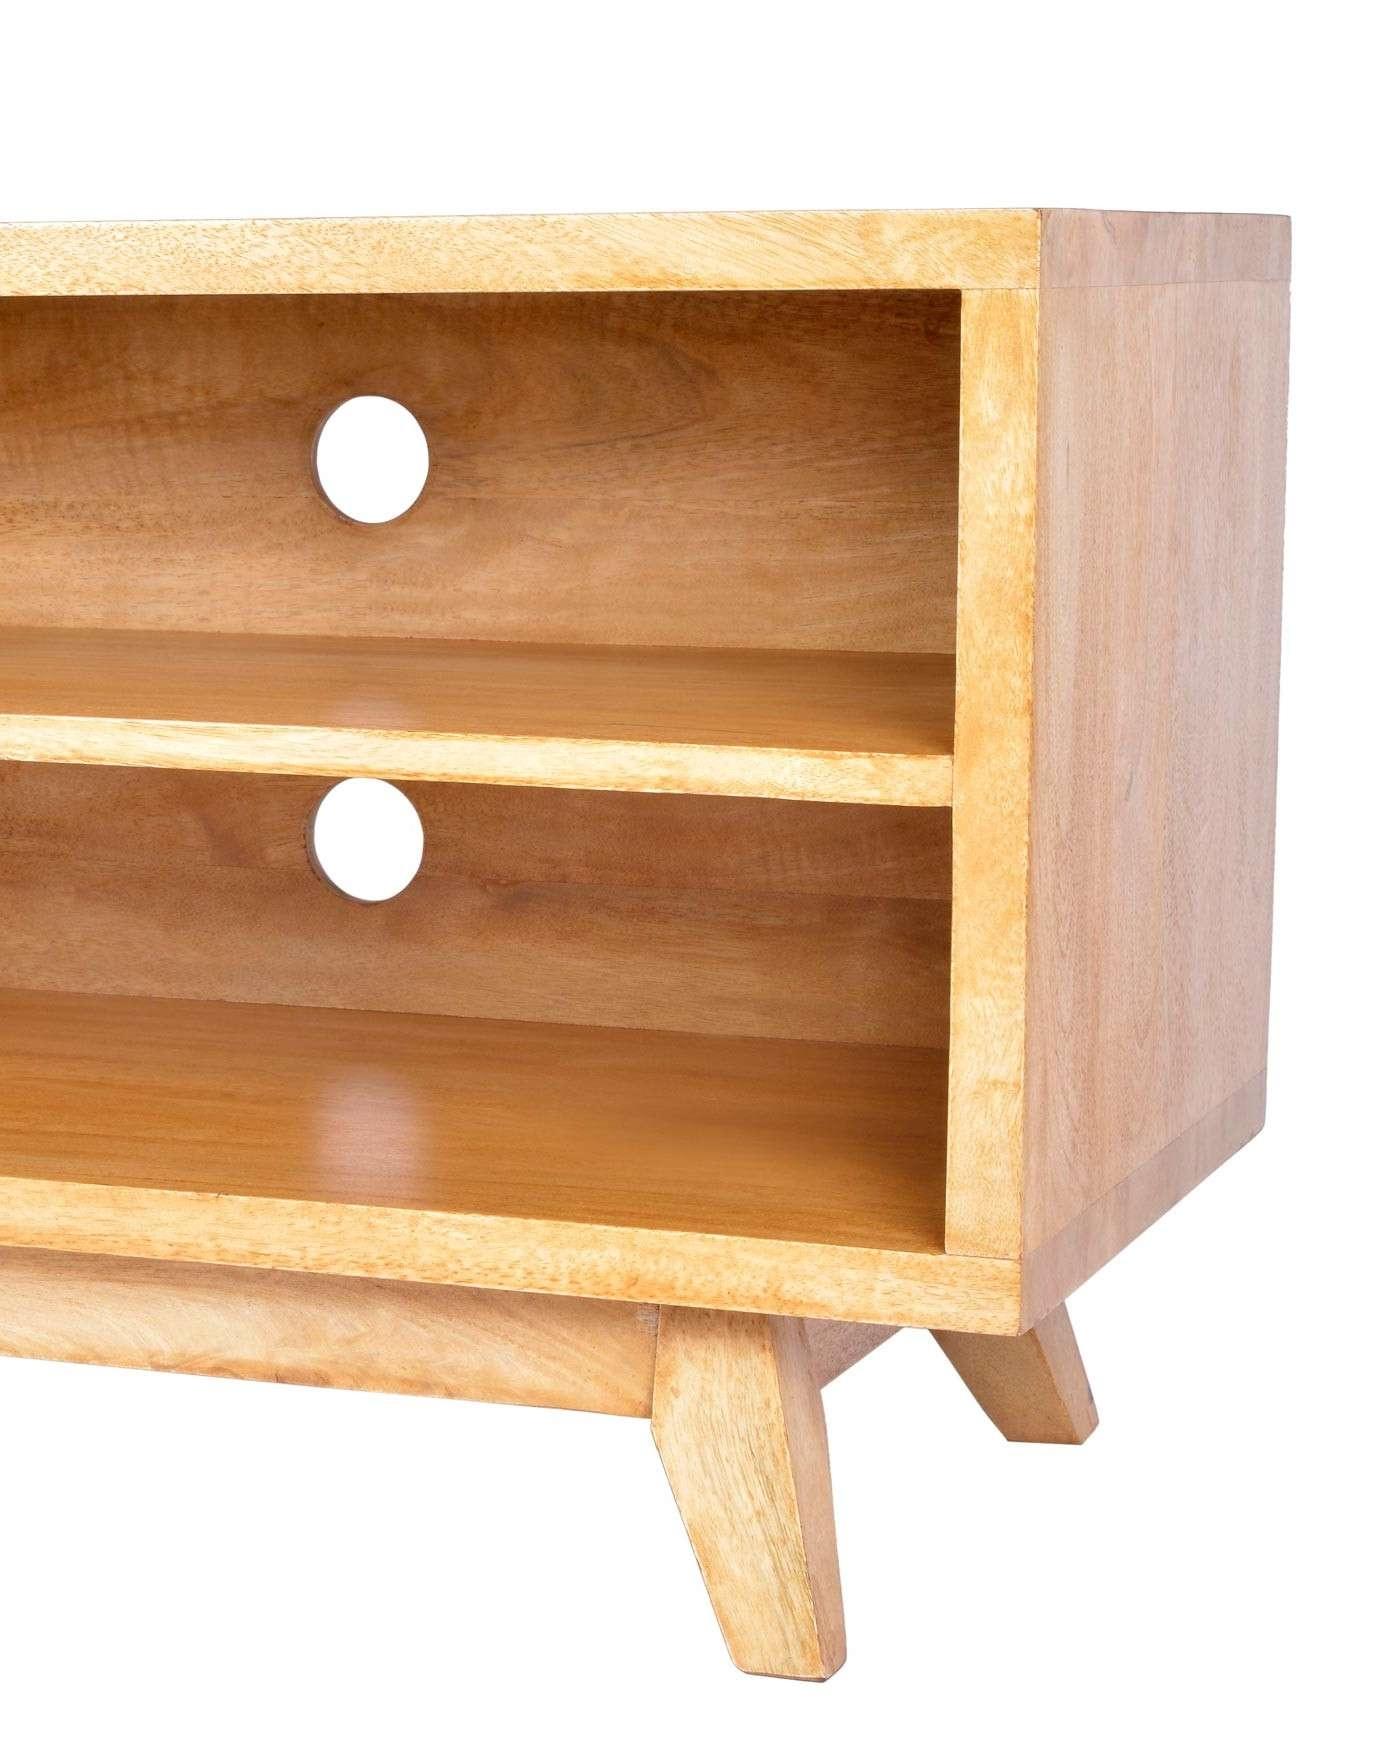 Tv : Mango Wood Tv Stands Gratifying Dark Mango Wood Tv Stand Pertaining To Mango Wood Tv Cabinets (View 16 of 20)